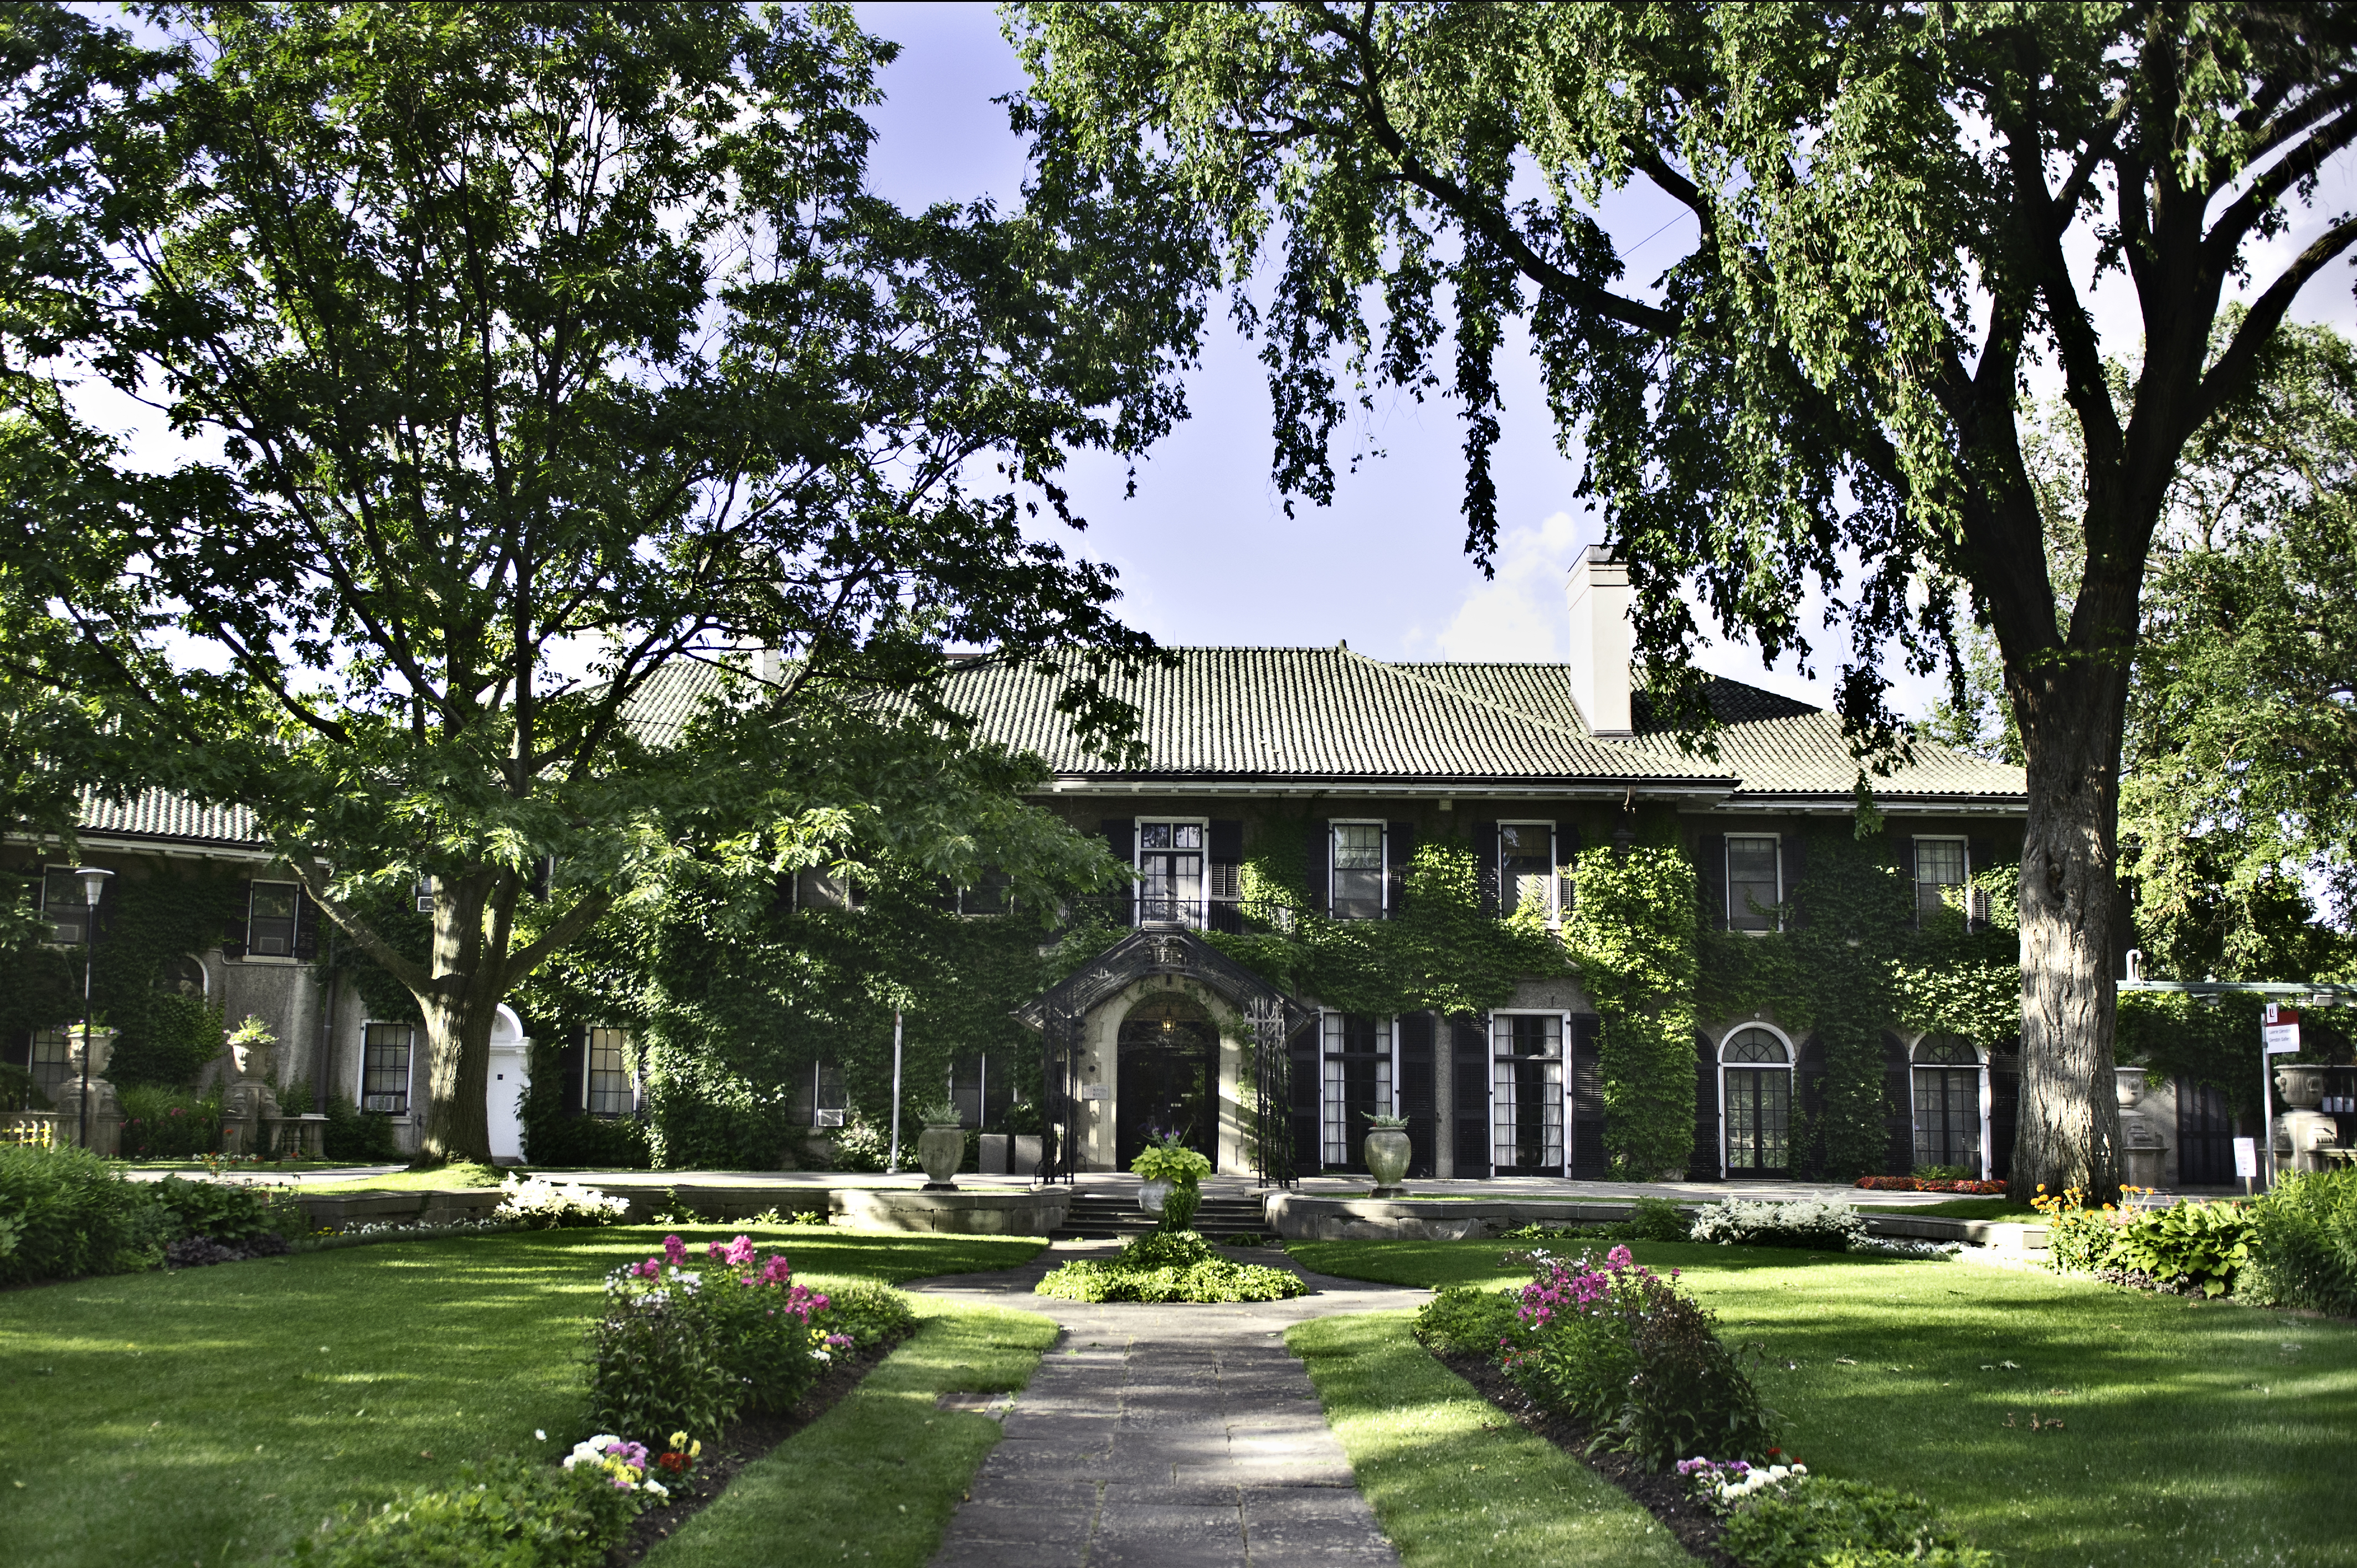 Glendon Hall